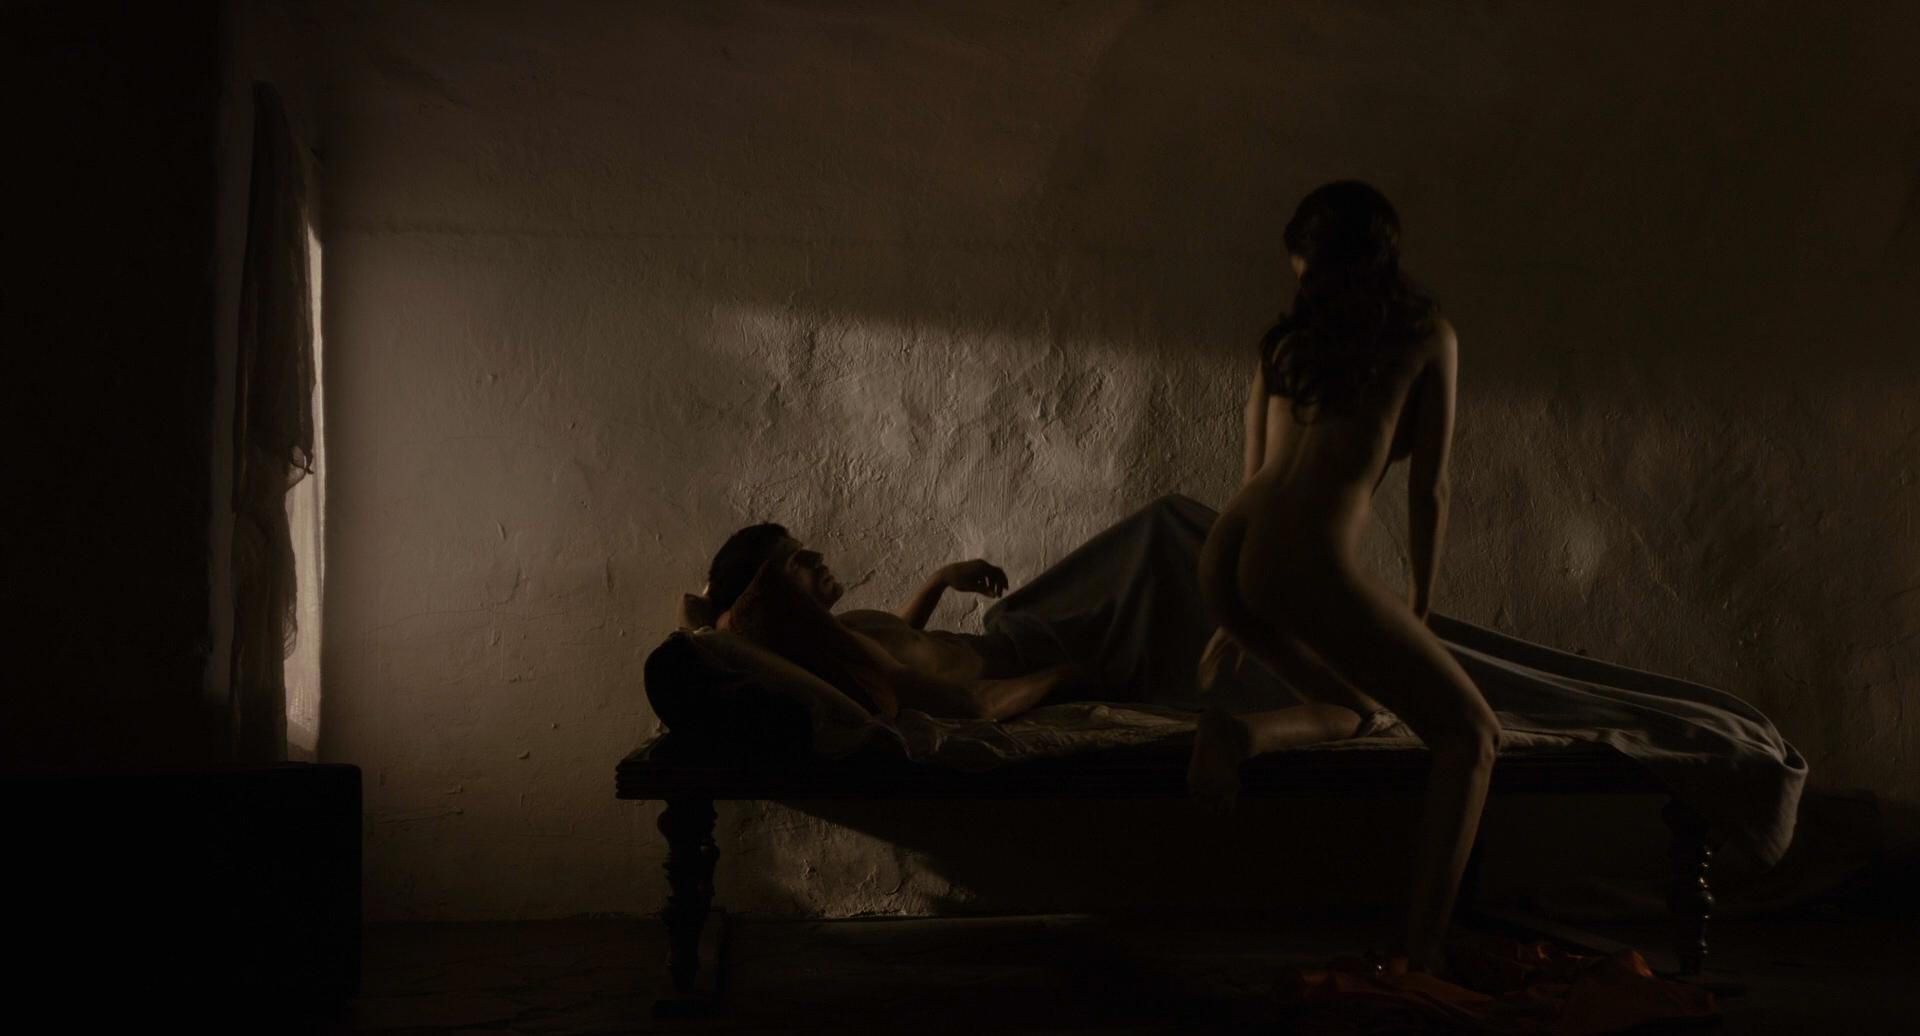 chaudhary-freida-pinto-nude-scenes-girl-fat